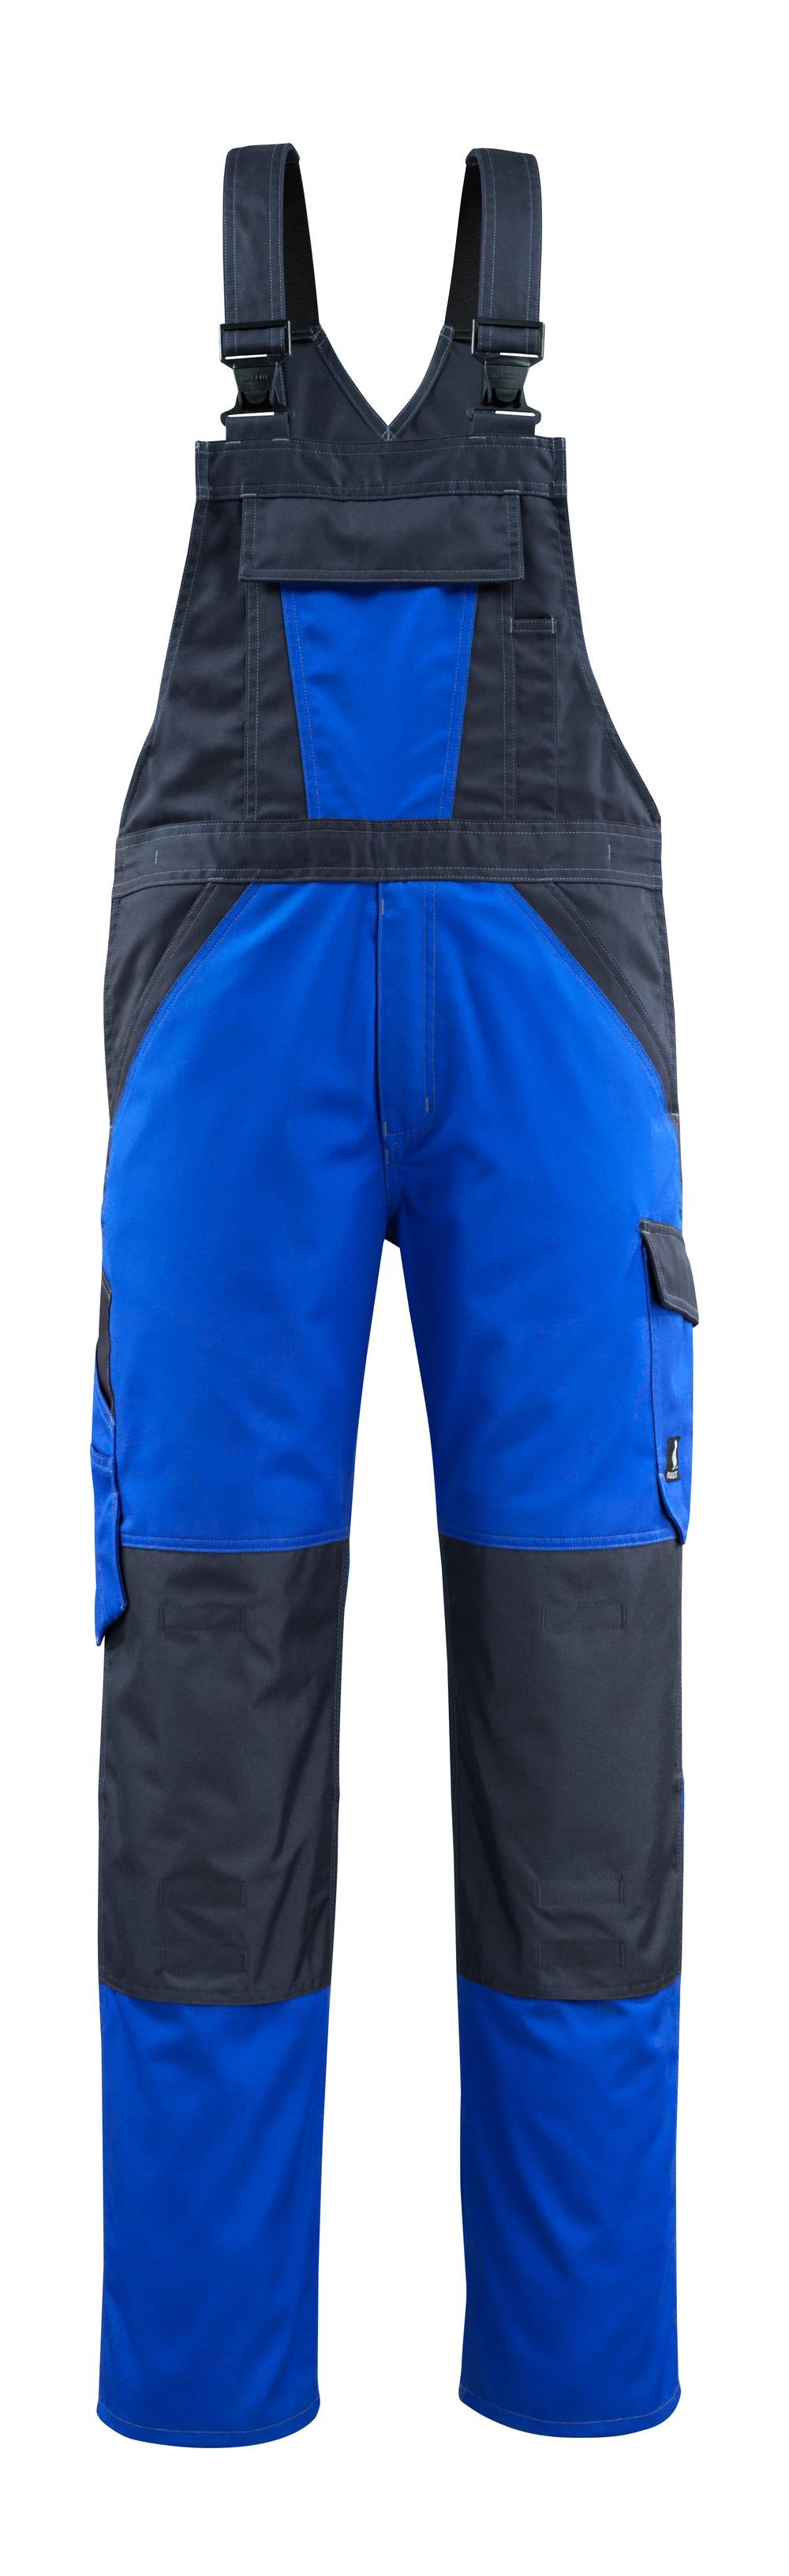 15769-330-11010 Amerikaanse overall met kniezakken - korenblauw/donkermarine